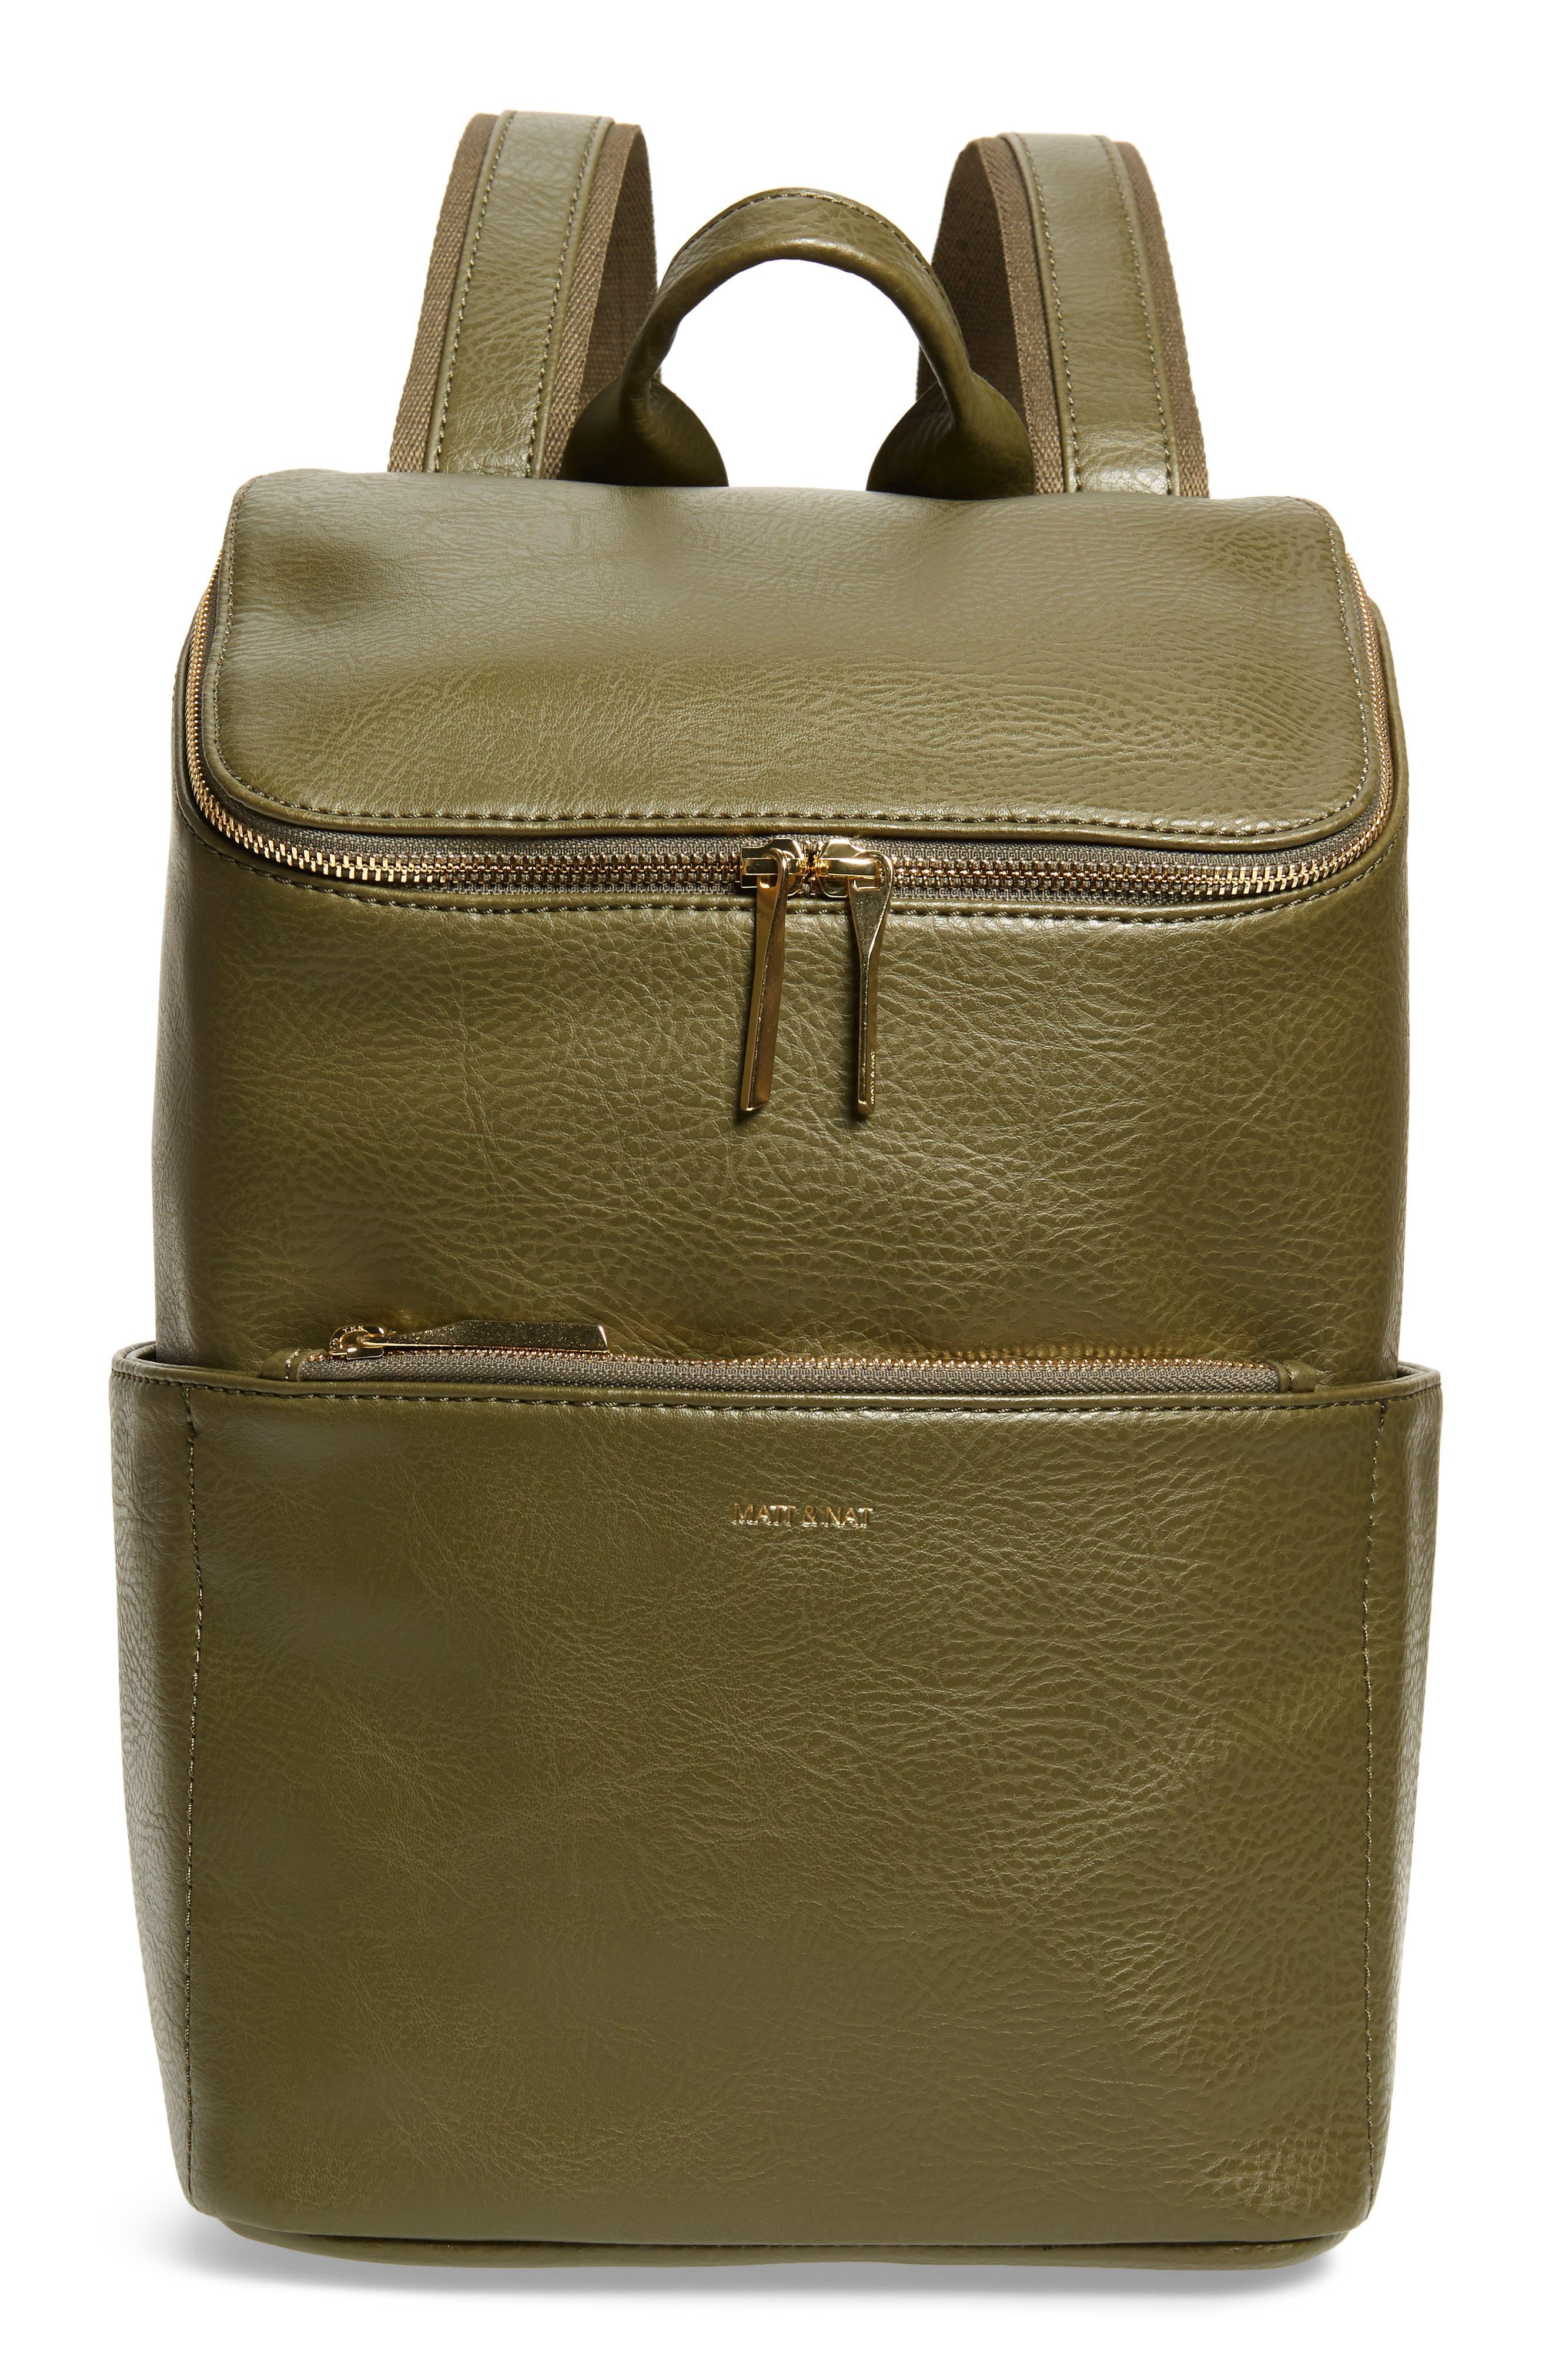 Image of Matt & Nat Brave Faux Leather Backpack